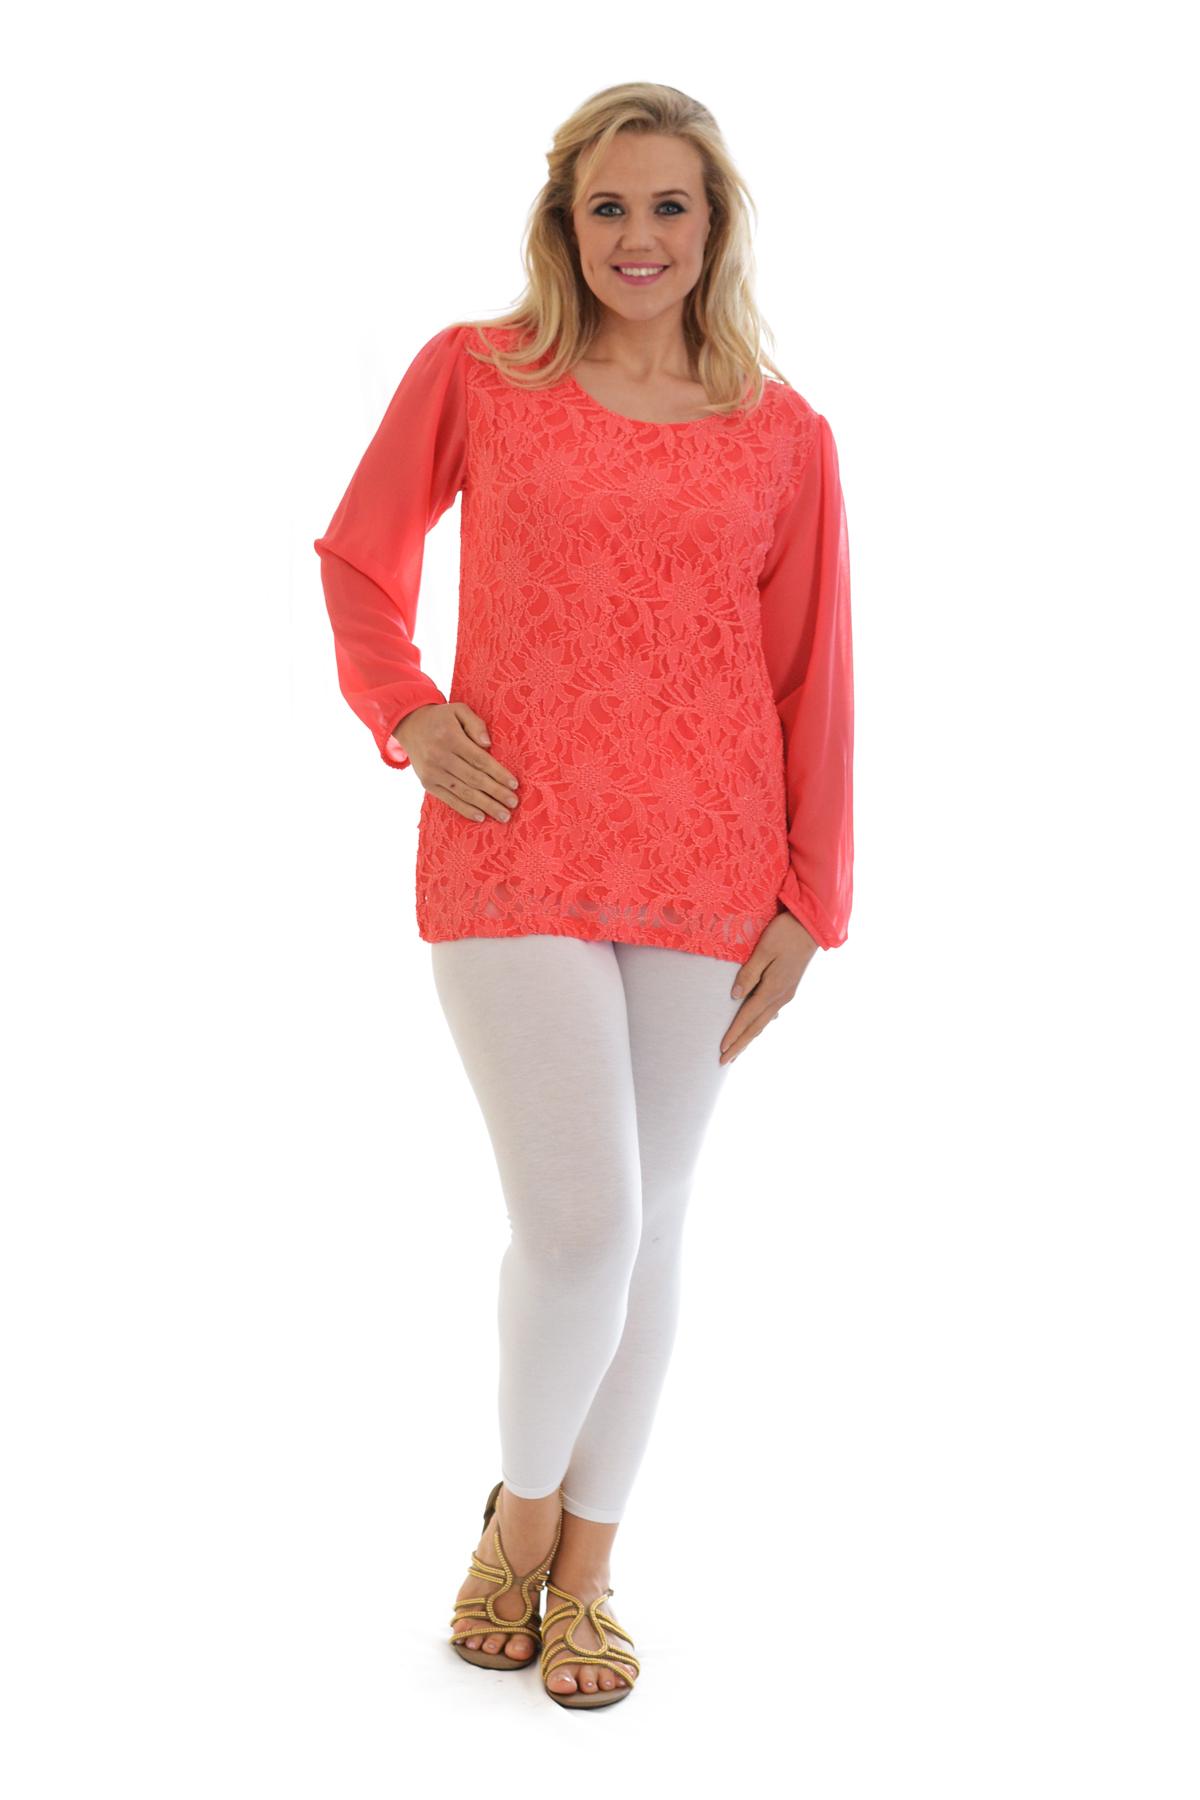 Womens-New-Lace-Top-Plus-Size-Ladies-Chiffon-Party-Arm-Floral-Tunic-Nouvelle